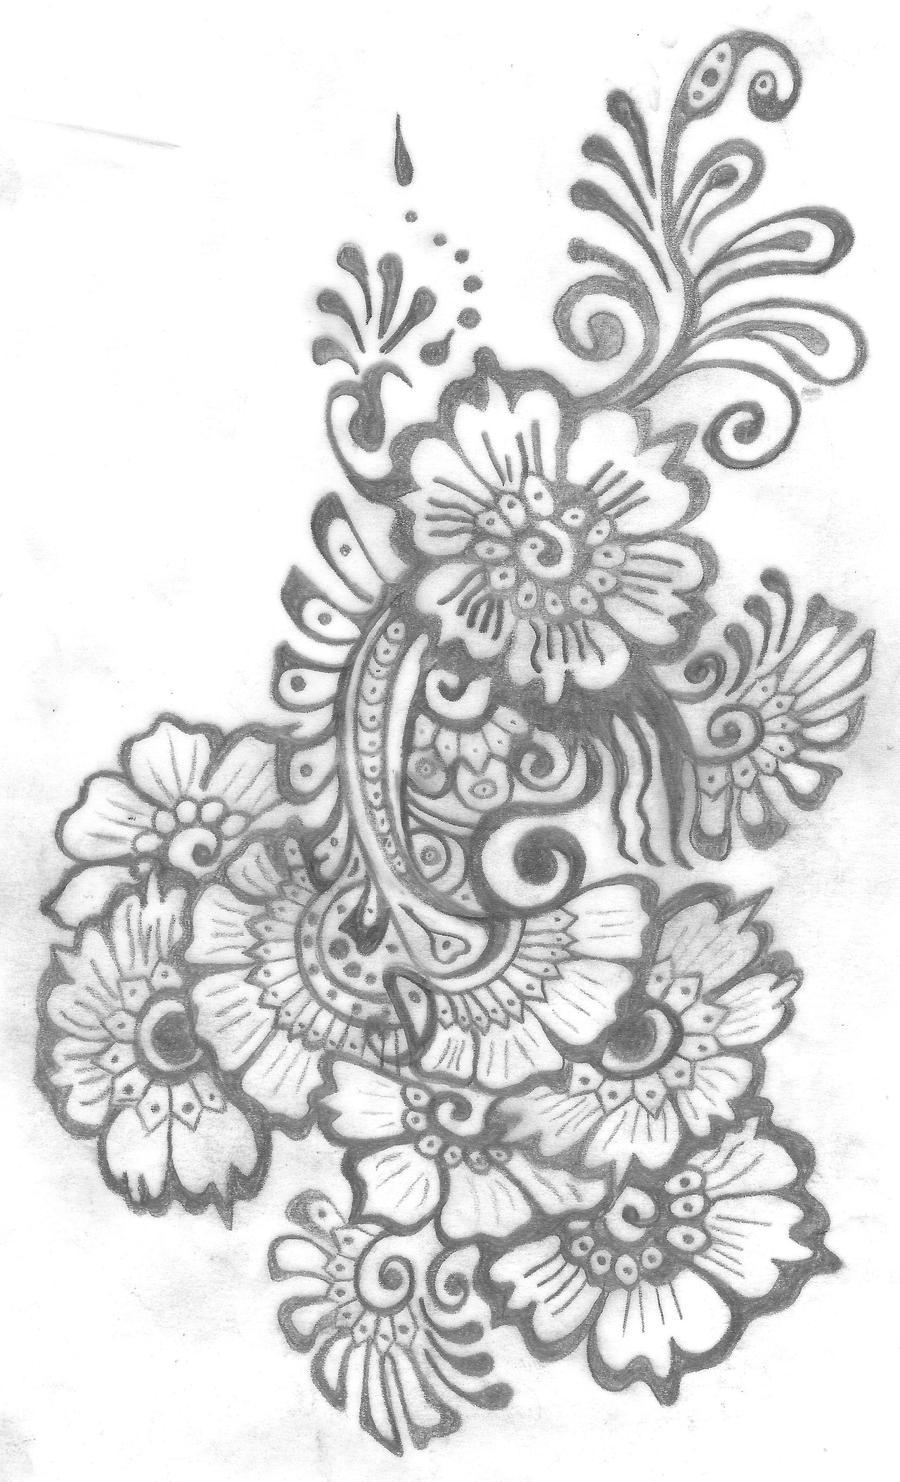 Mehndi Quotes For Her : My mehndi tattoo design by shurumitattoomi on deviantart